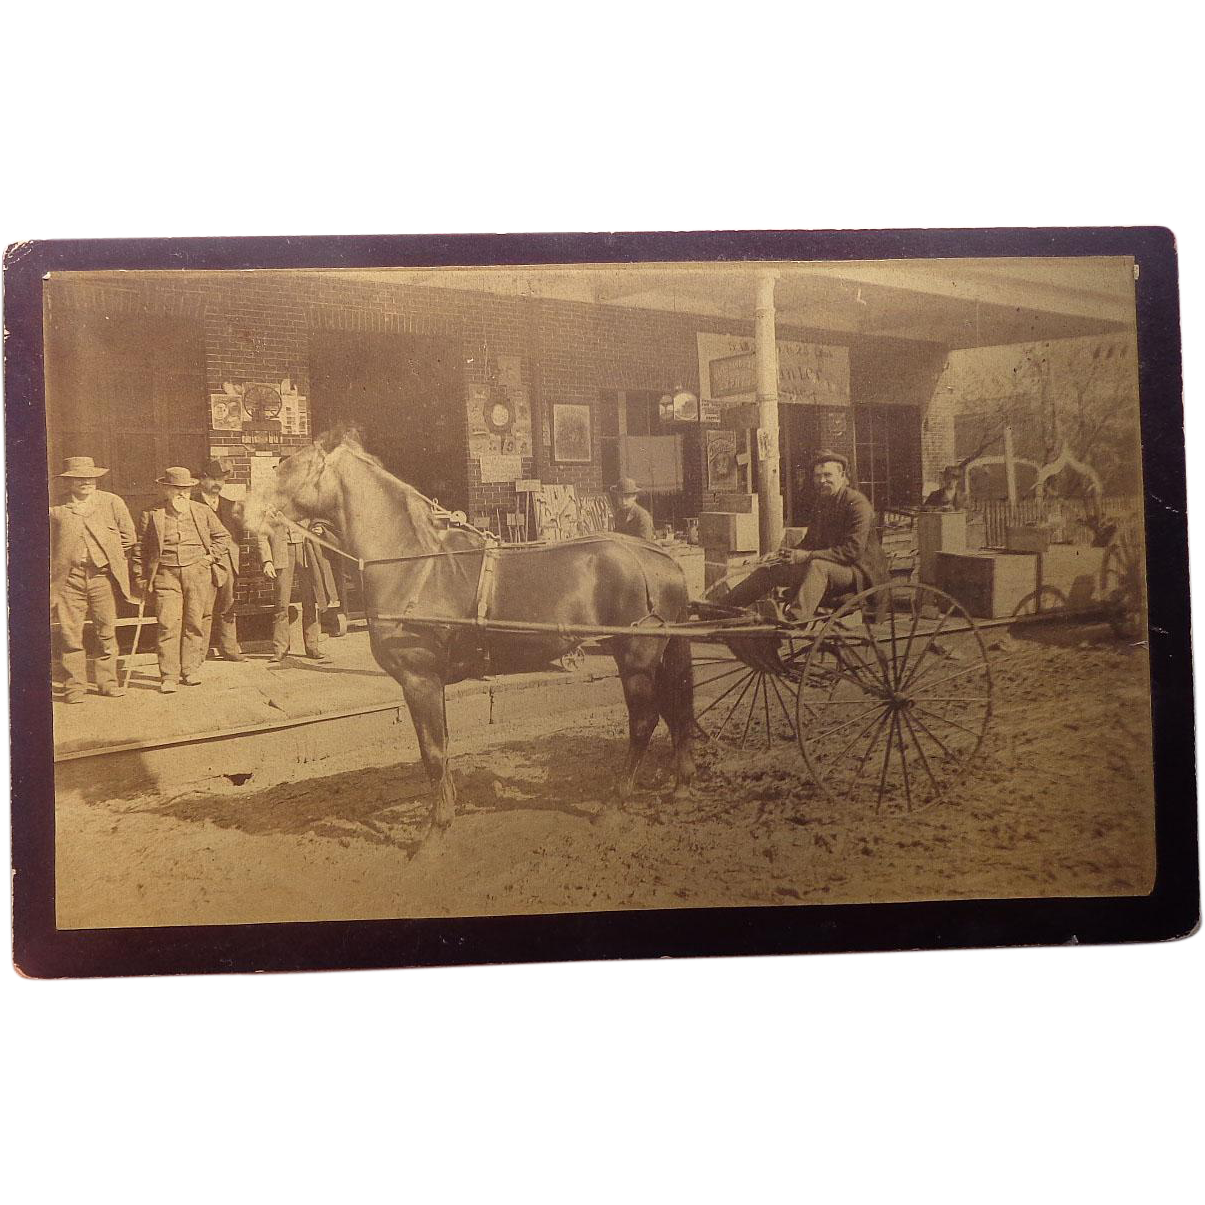 Boudoir Sized Cabinet Photo Of Texas Wells Fargo General Store 1880 39 S